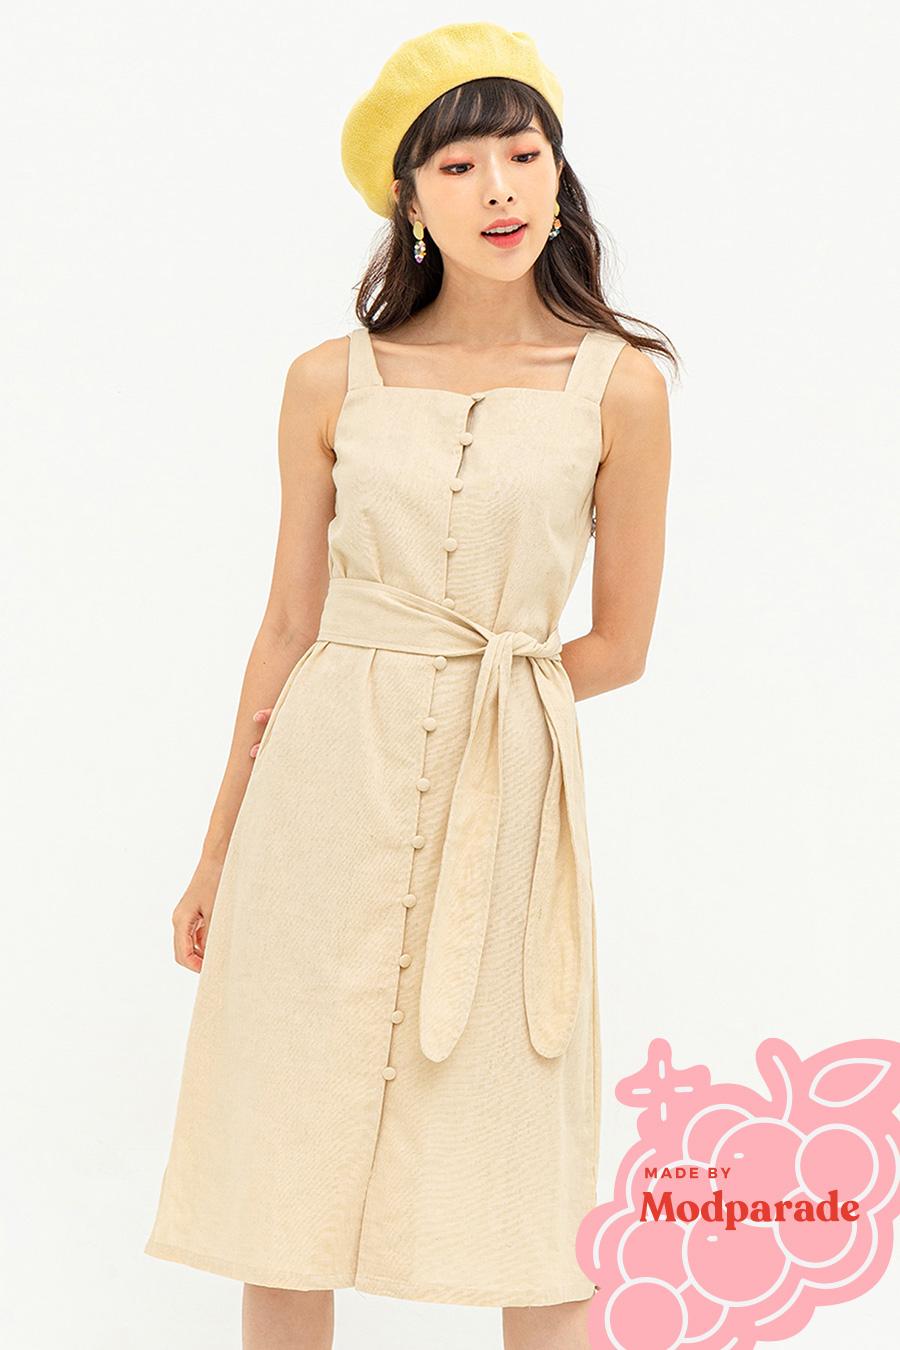 CAROLE DRESS - VANILLA CUSTARD [BY MODPARADE]